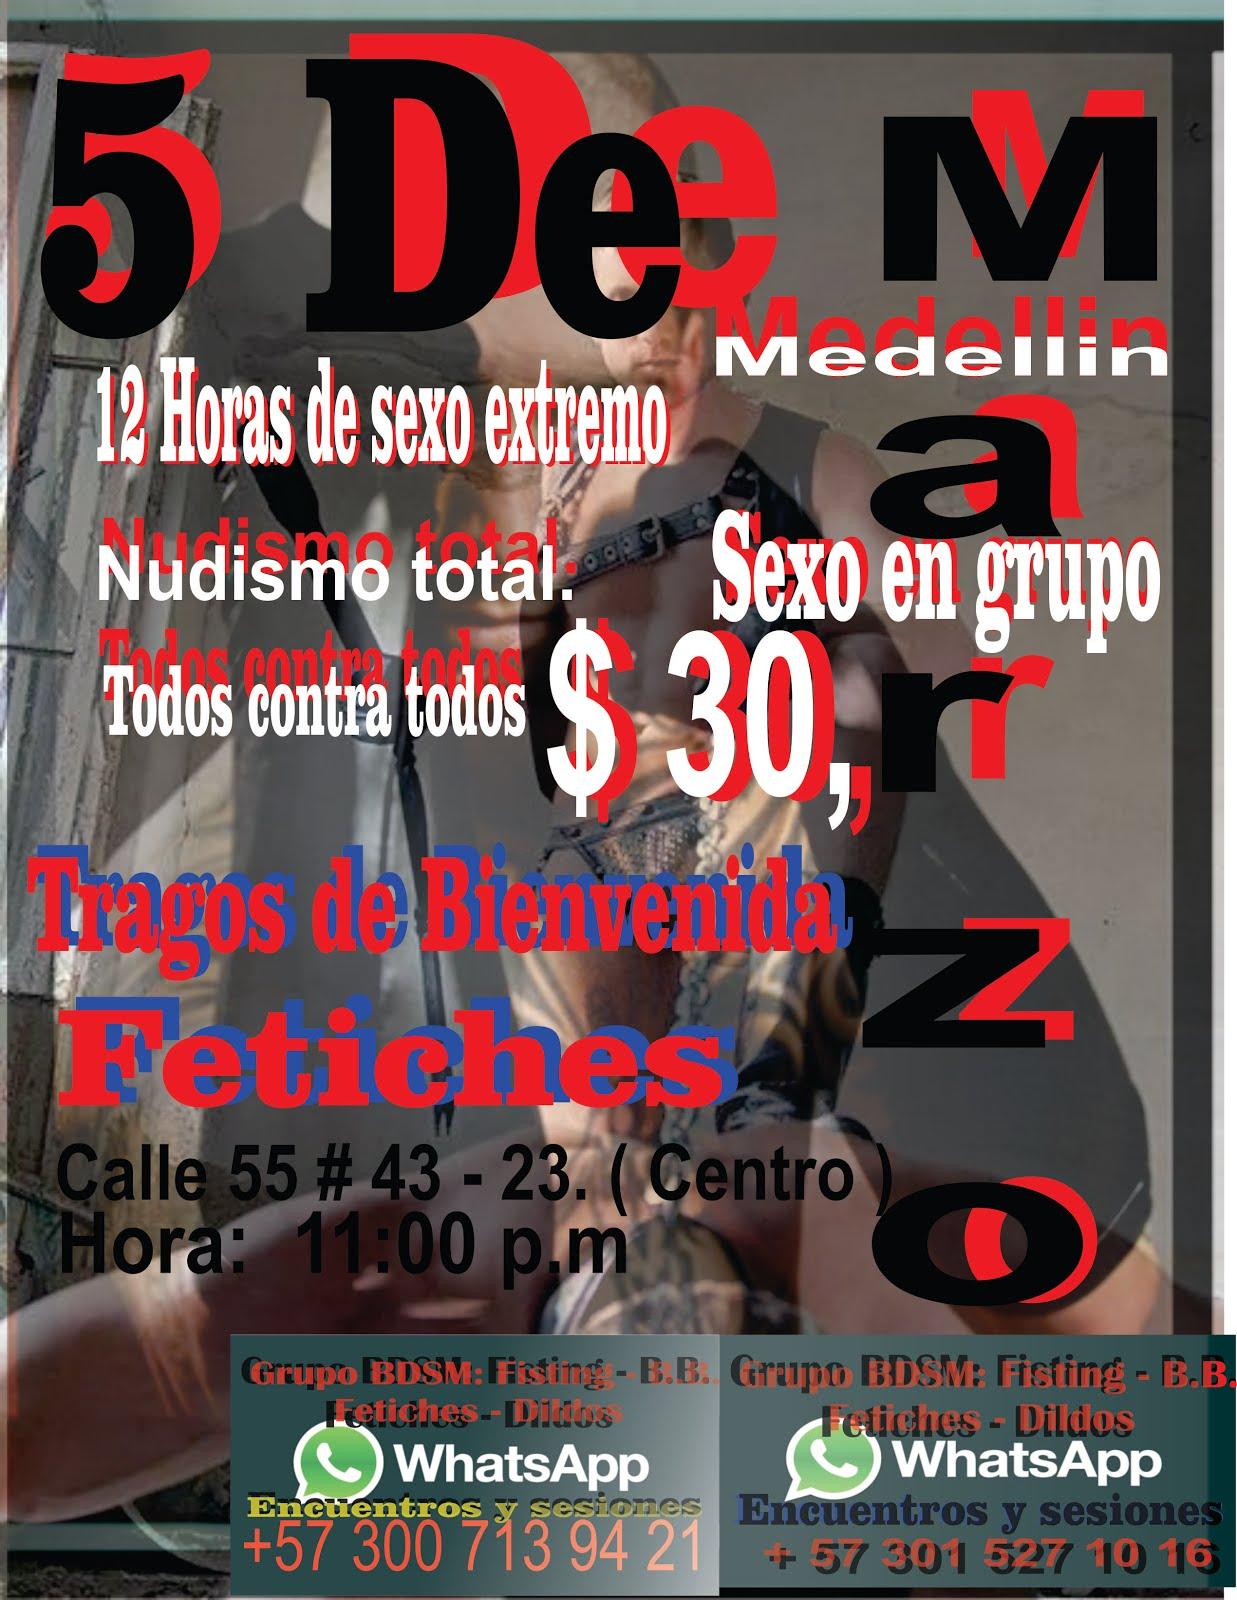 ENCUENTRO: TODOS CONTRA TODOS !!!!! SE VALE TODO.. Fetiches, Fisting, Bareback, Dildos, Orgias, Nud